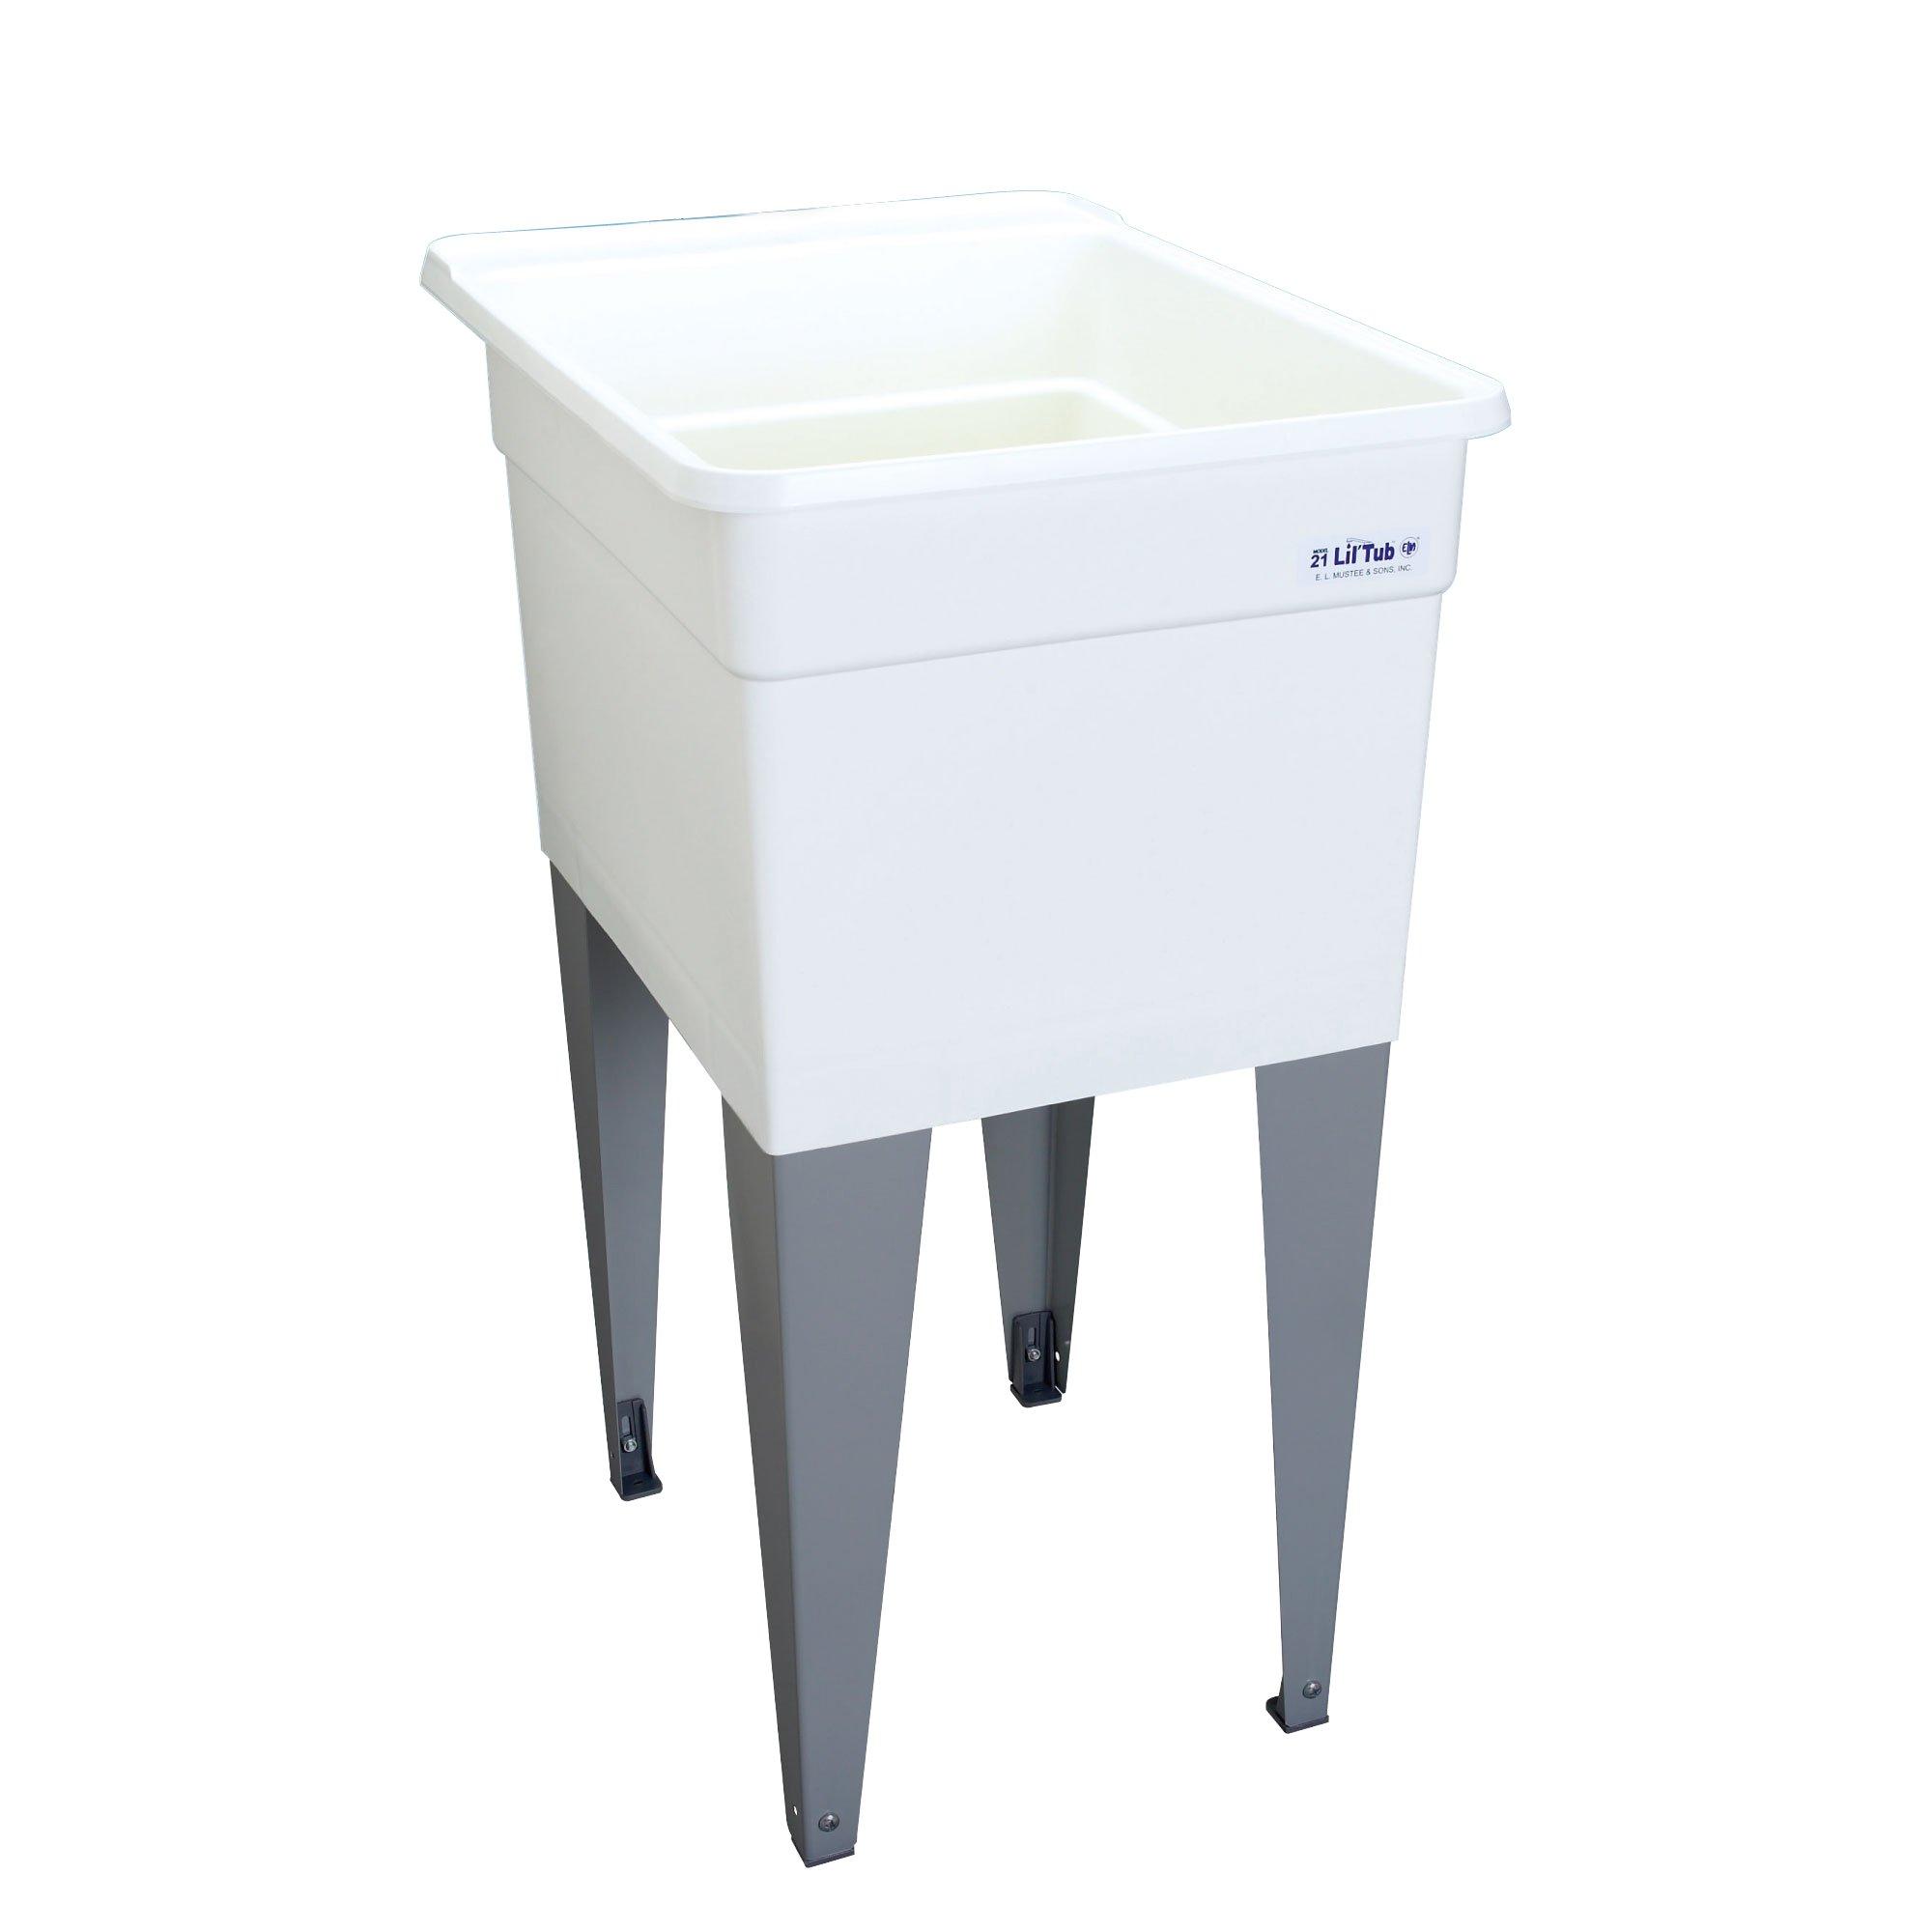 Mustee 21F Lil'Tub Utilatub Laundry Tub Floor Mount, 24-Inch x 18-Inch, White